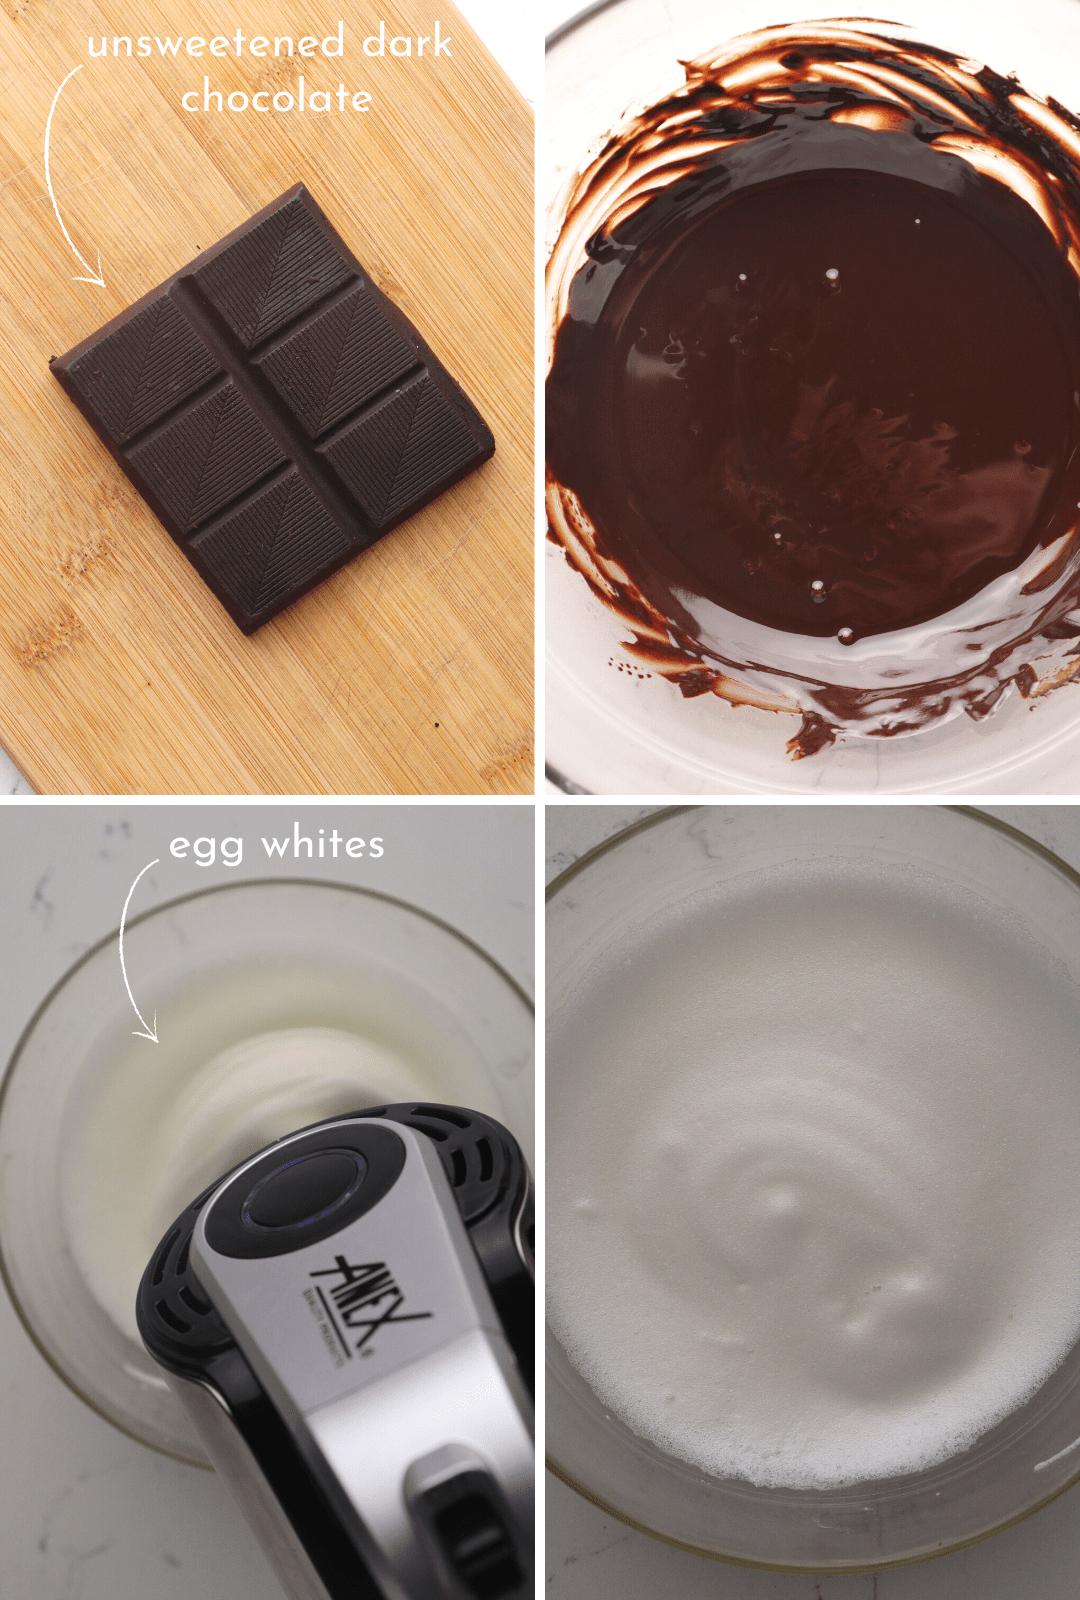 keto-chocolate-mousse-procedure-collage-thehealthcreative